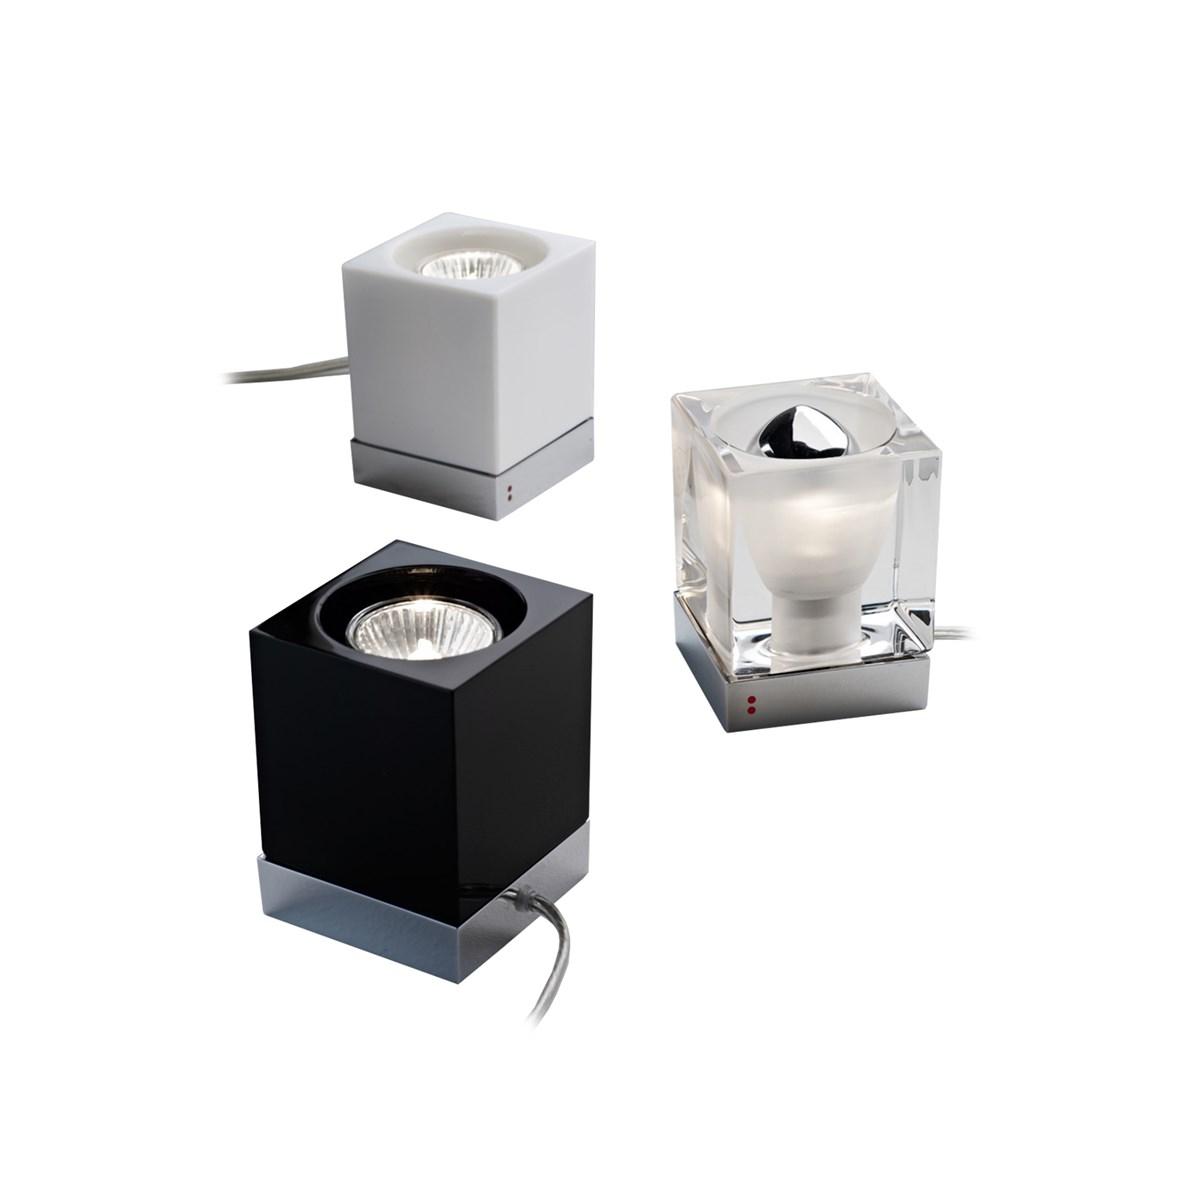 Fabbian-Pamio Design-Cubetto-Table-Lamp-Matisse-1